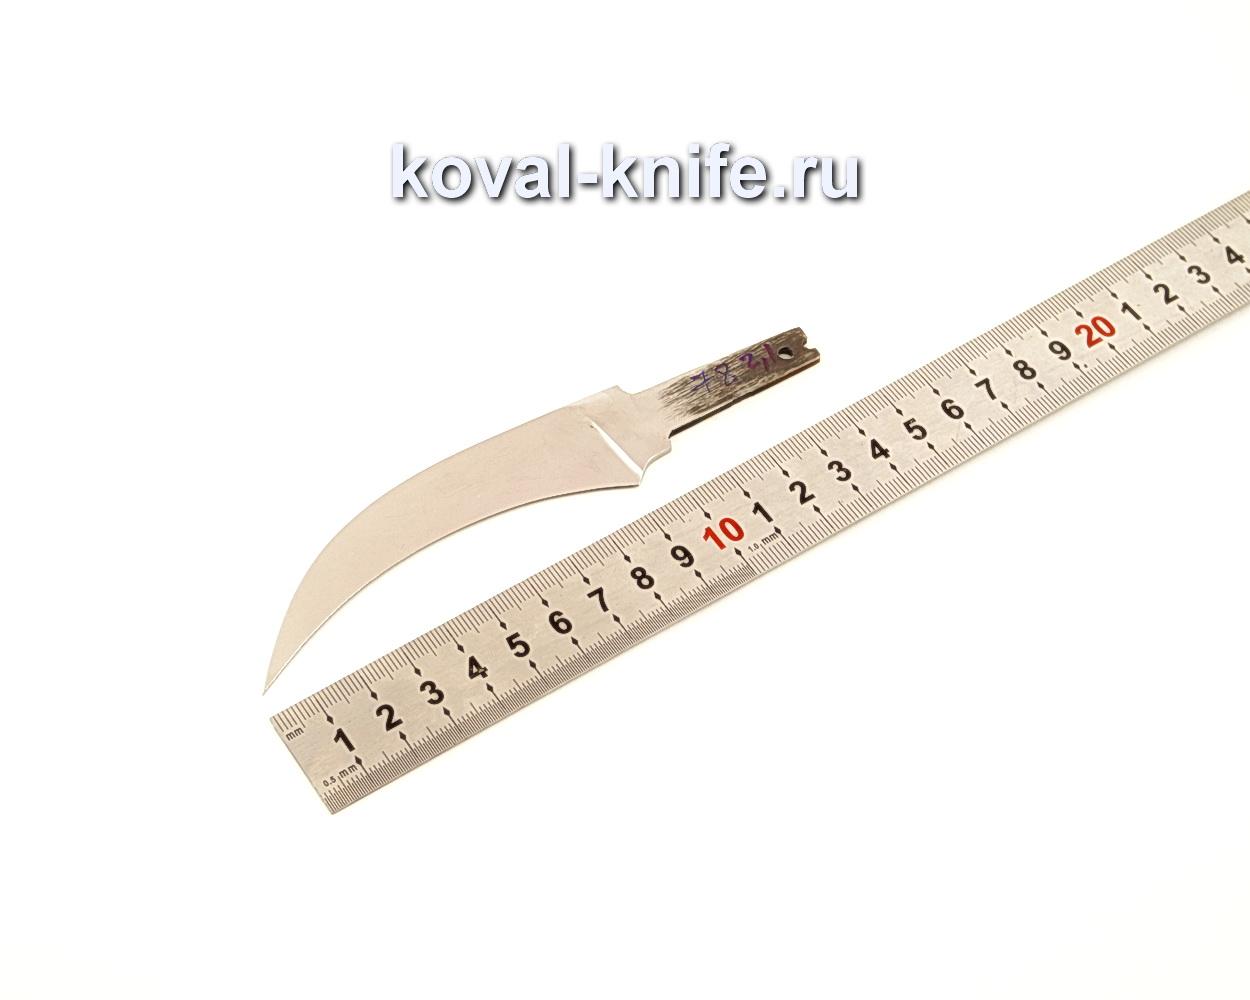 Клинок для ножа из кованой стали Х12МФ N78